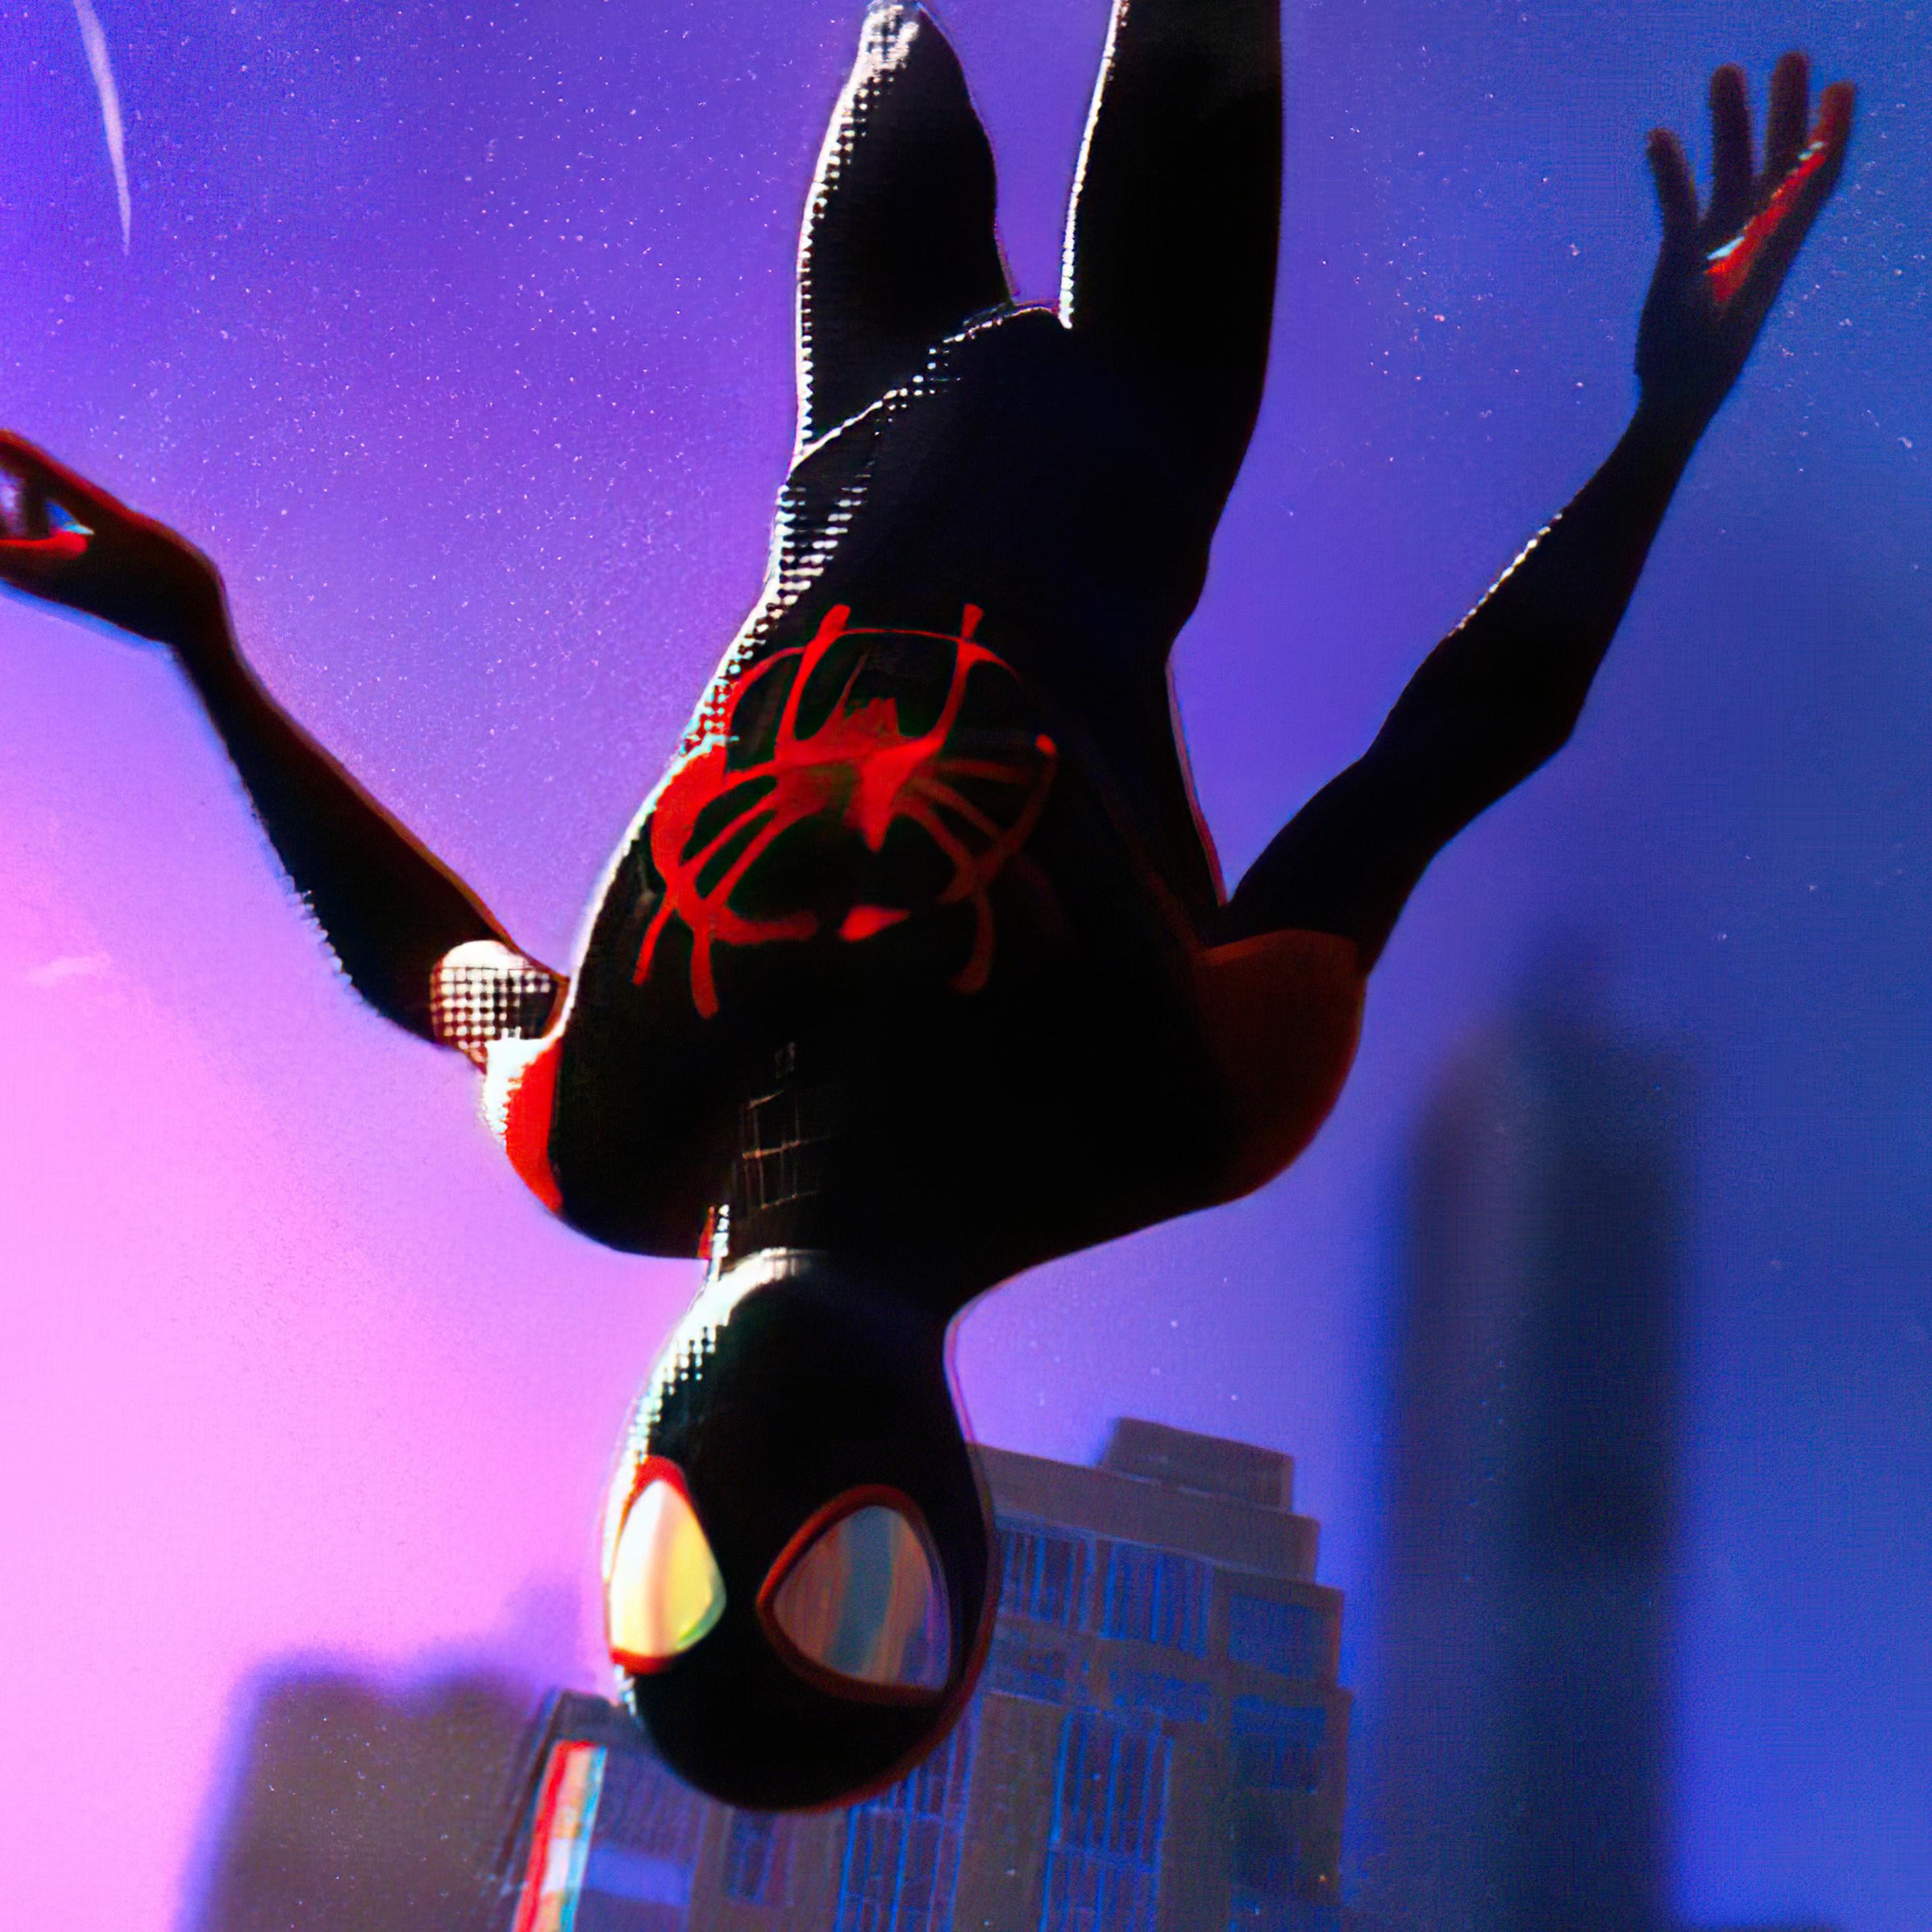 2932x2932 Spiderman Ps5 Miles Morales 4k 2021 Ipad Pro ...